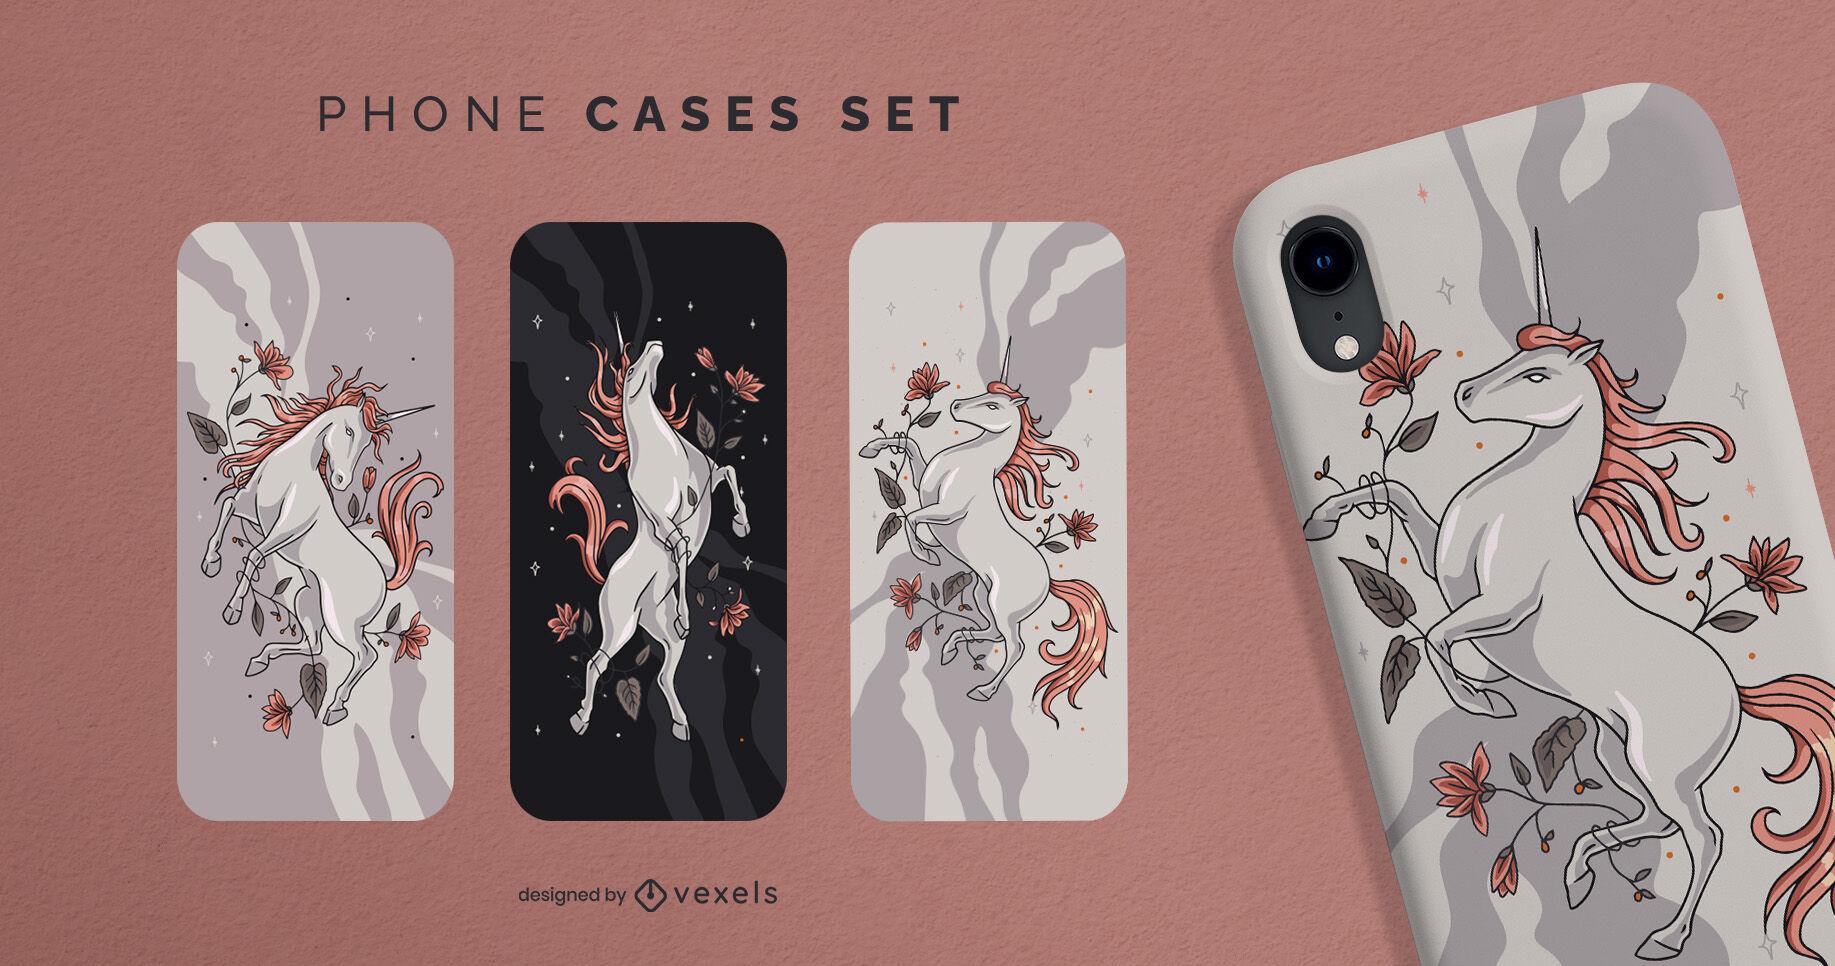 Magisches Einhorn-Kreaturen-Handyhüllen-Set